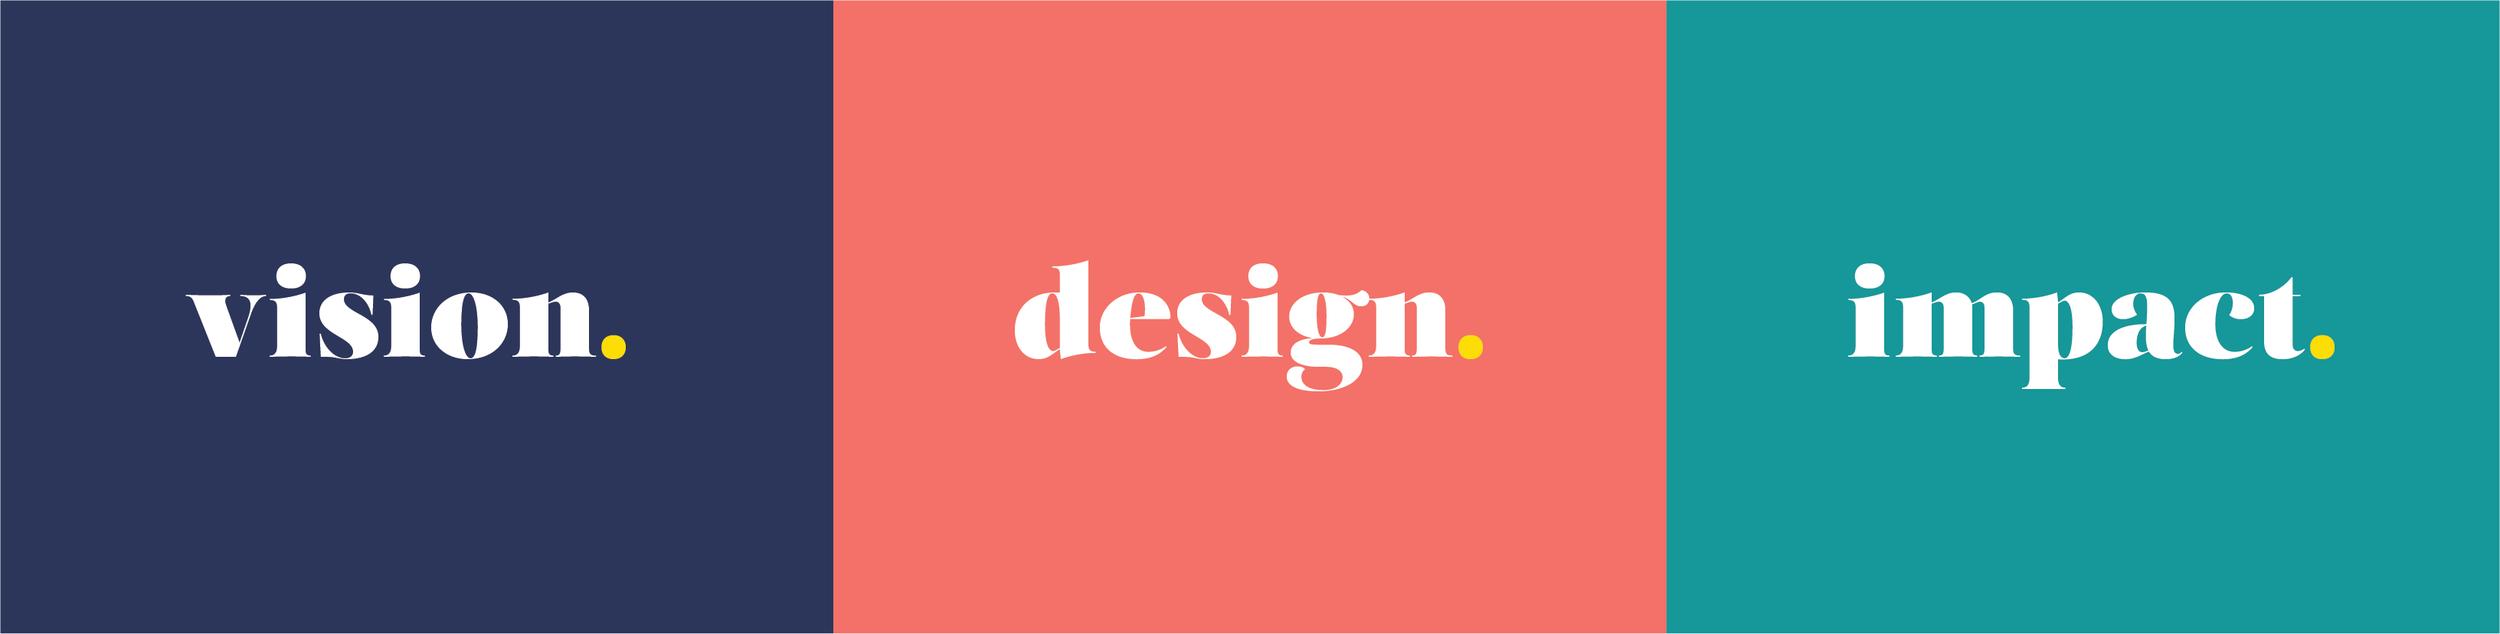 Vision-Design-Impact.png